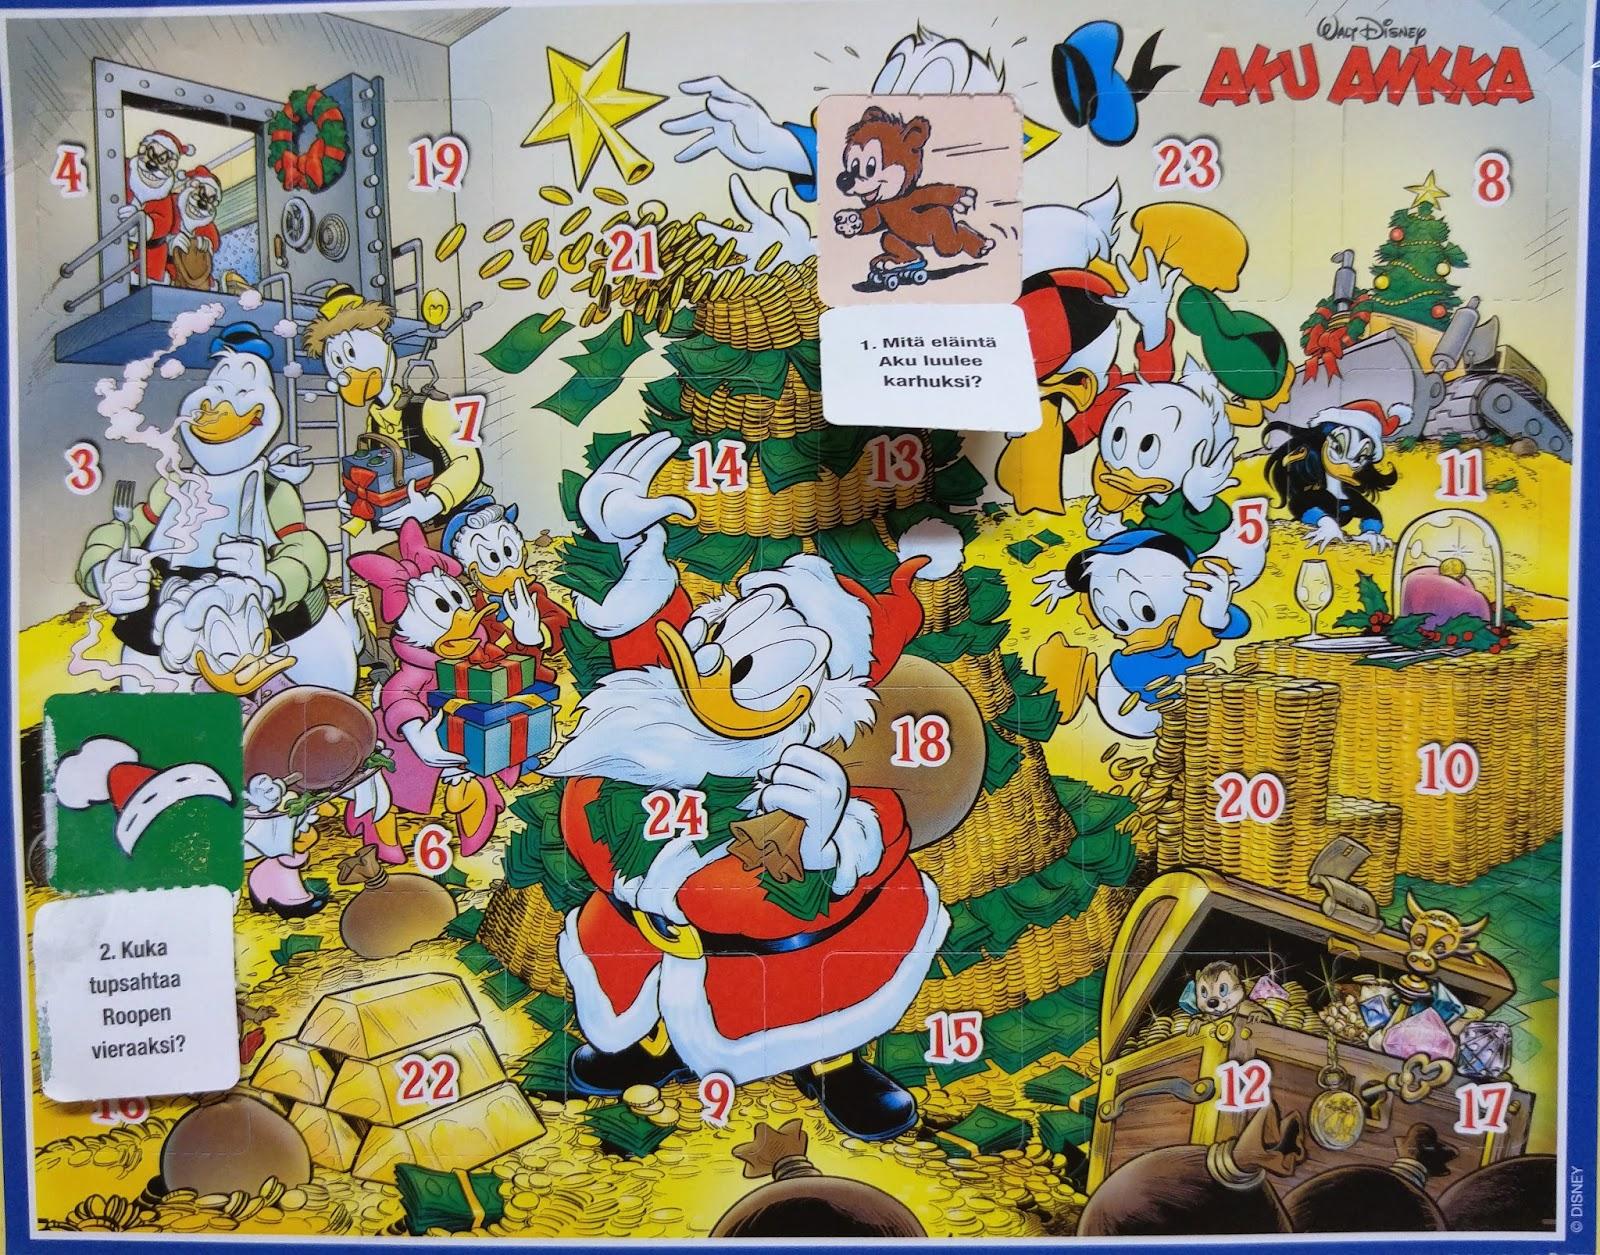 aku ankka joulukalenteri Joulu Mimmin luona: Joulukalenterit 2015 aku ankka joulukalenteri